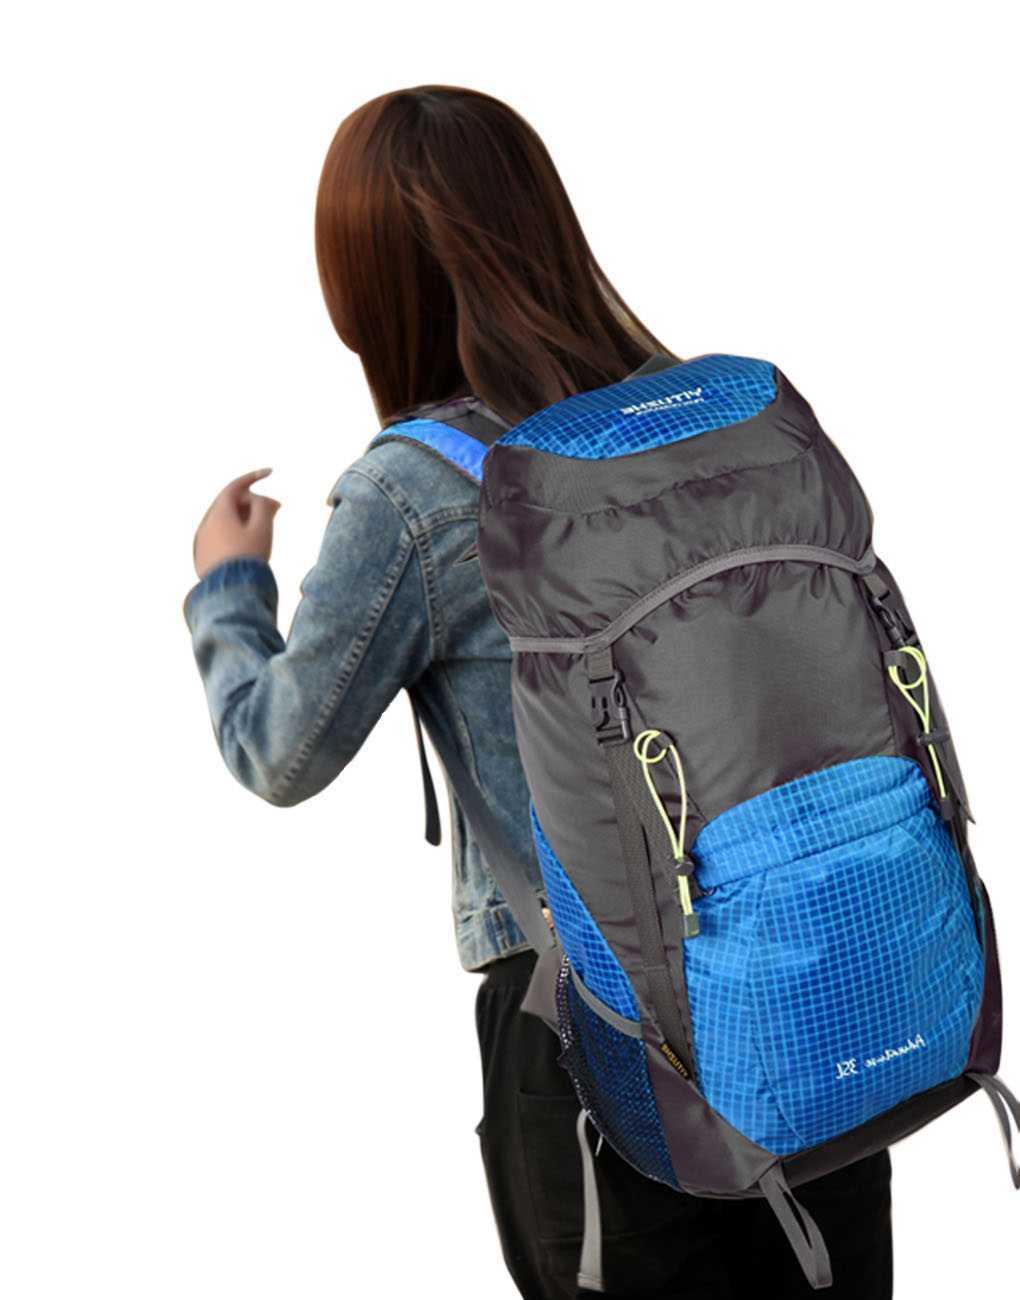 ... Adapula Ultra Profesional Luar Ruangan Tahan Air Tas LipatClimbling Packable Hiking Ransel Perjalanan Ransel Semua KebutuhanBisnis ...